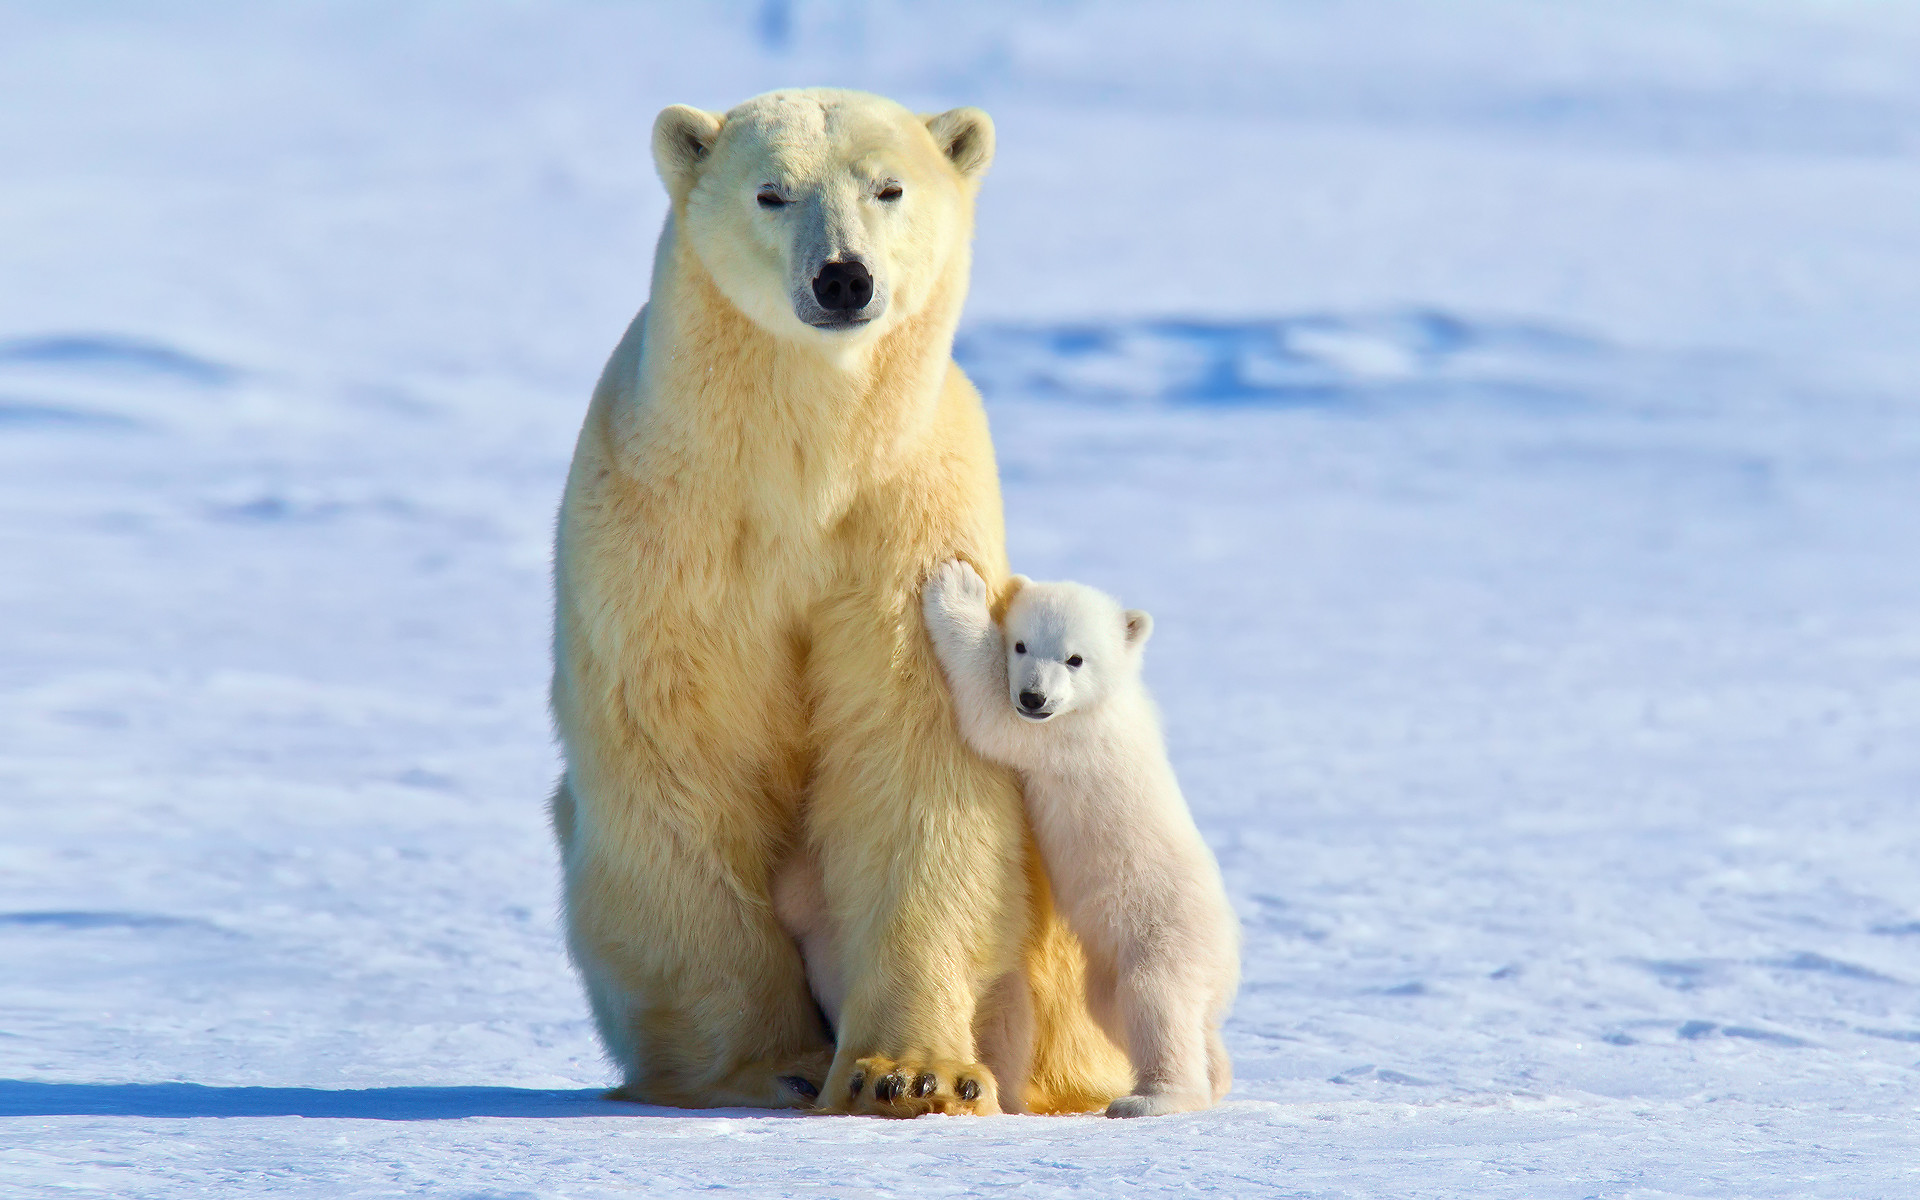 baby polar bear wallpaper (52+ images)